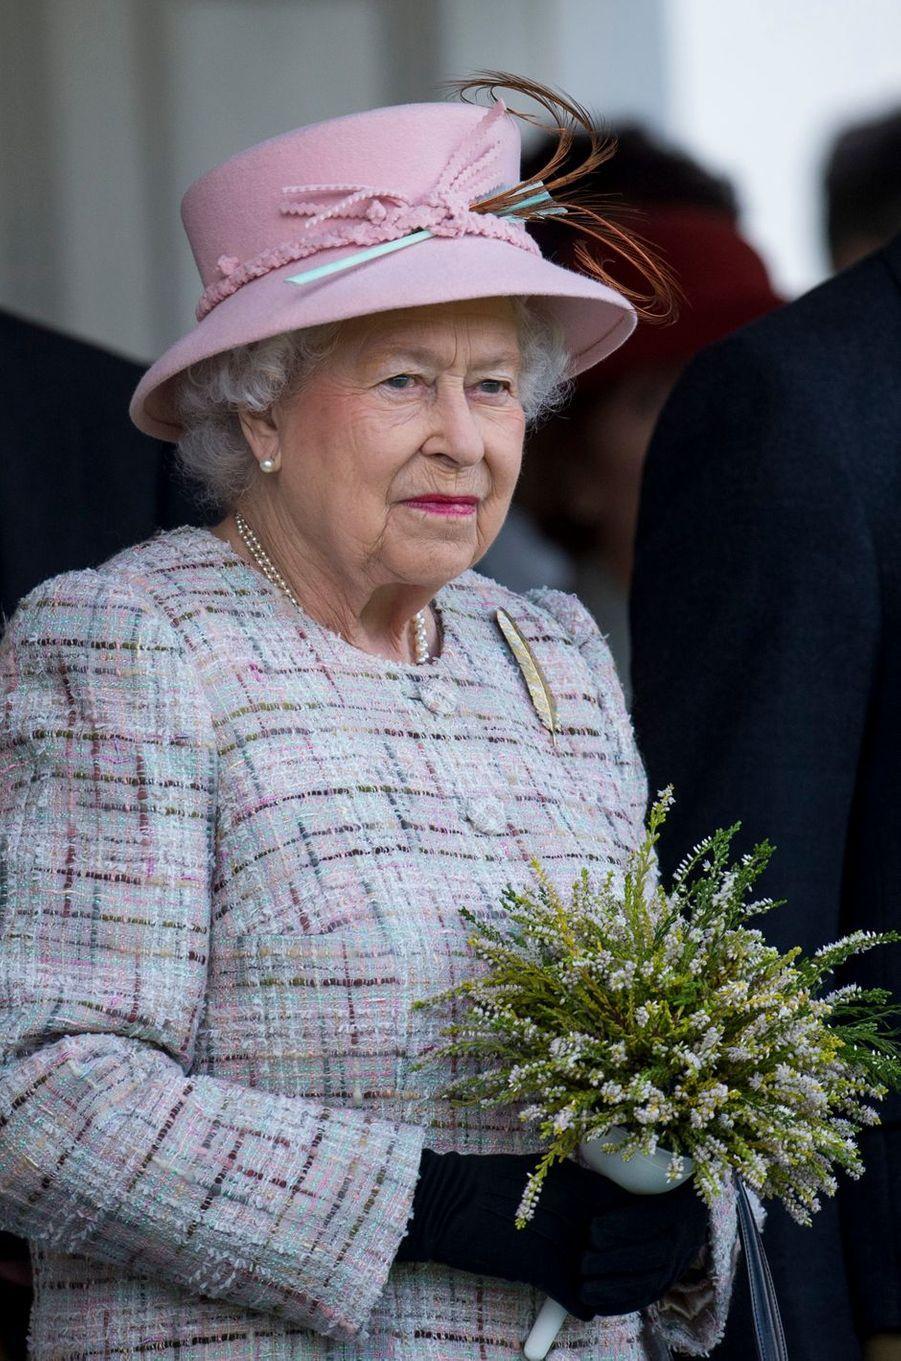 La reine Elizabeth II au Highlands Braemar Gathering, le 2 septembre 2017